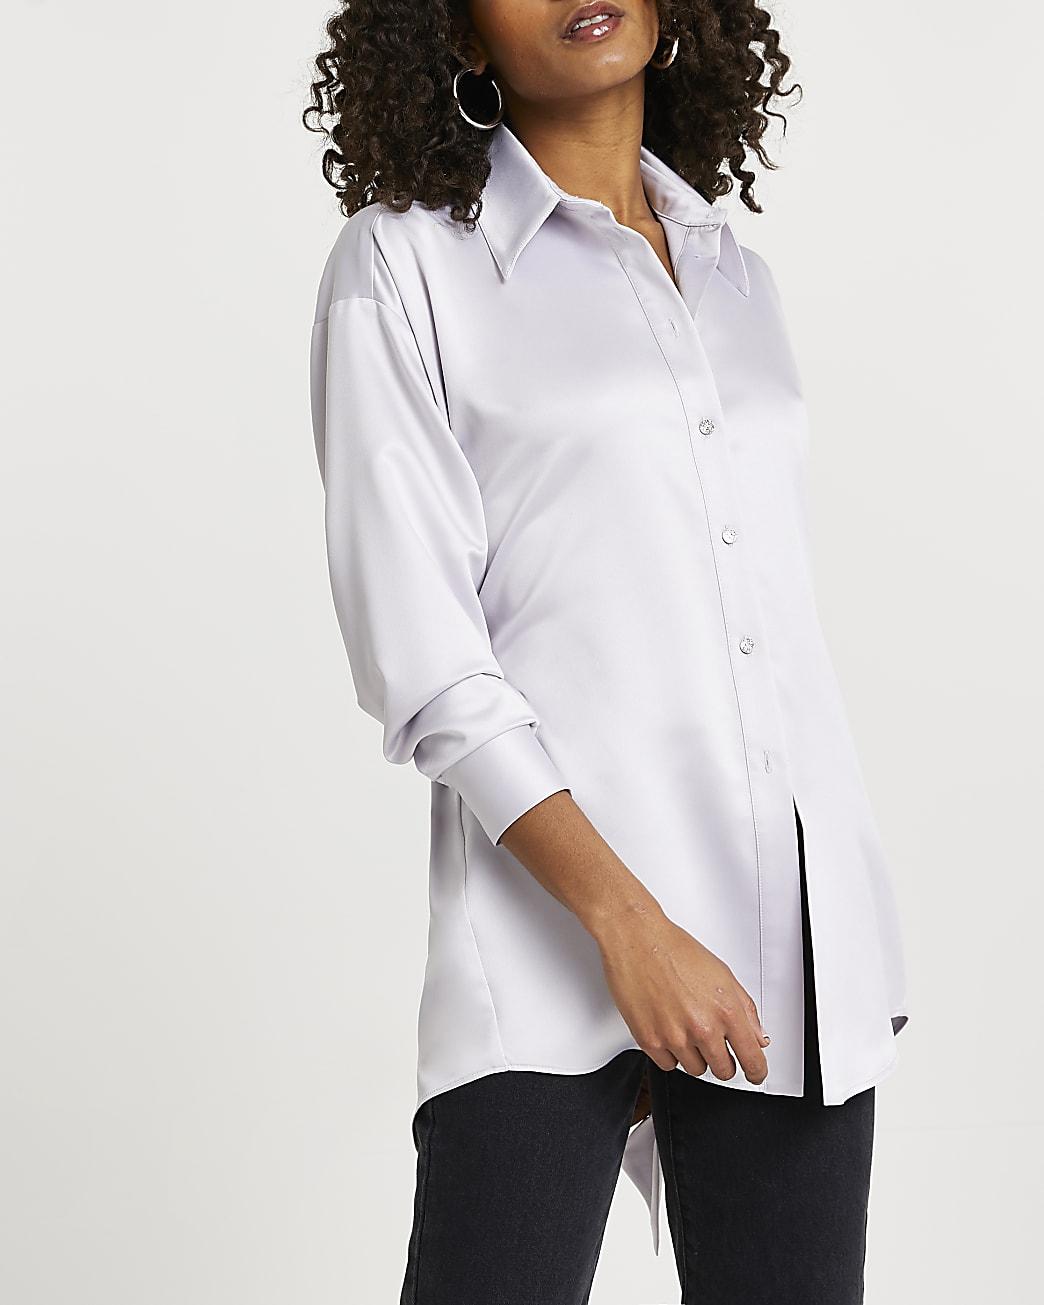 Grey open back long sleeve shirt